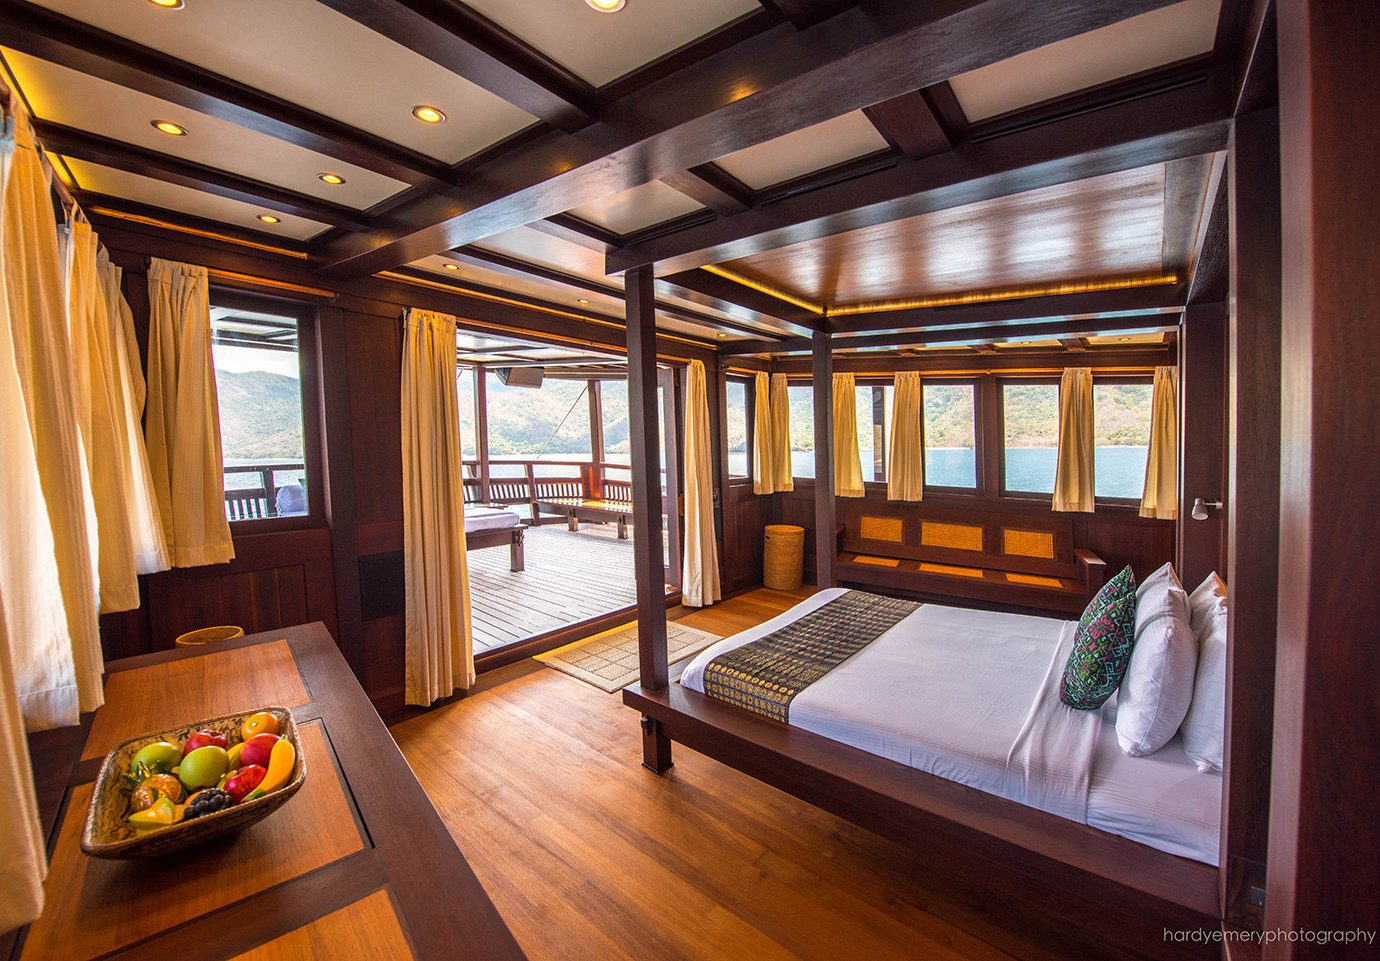 Luxury Travel Trip Ideas indoor floor room interior design window real estate wood wooden house Suite estate ceiling furniture overlooking